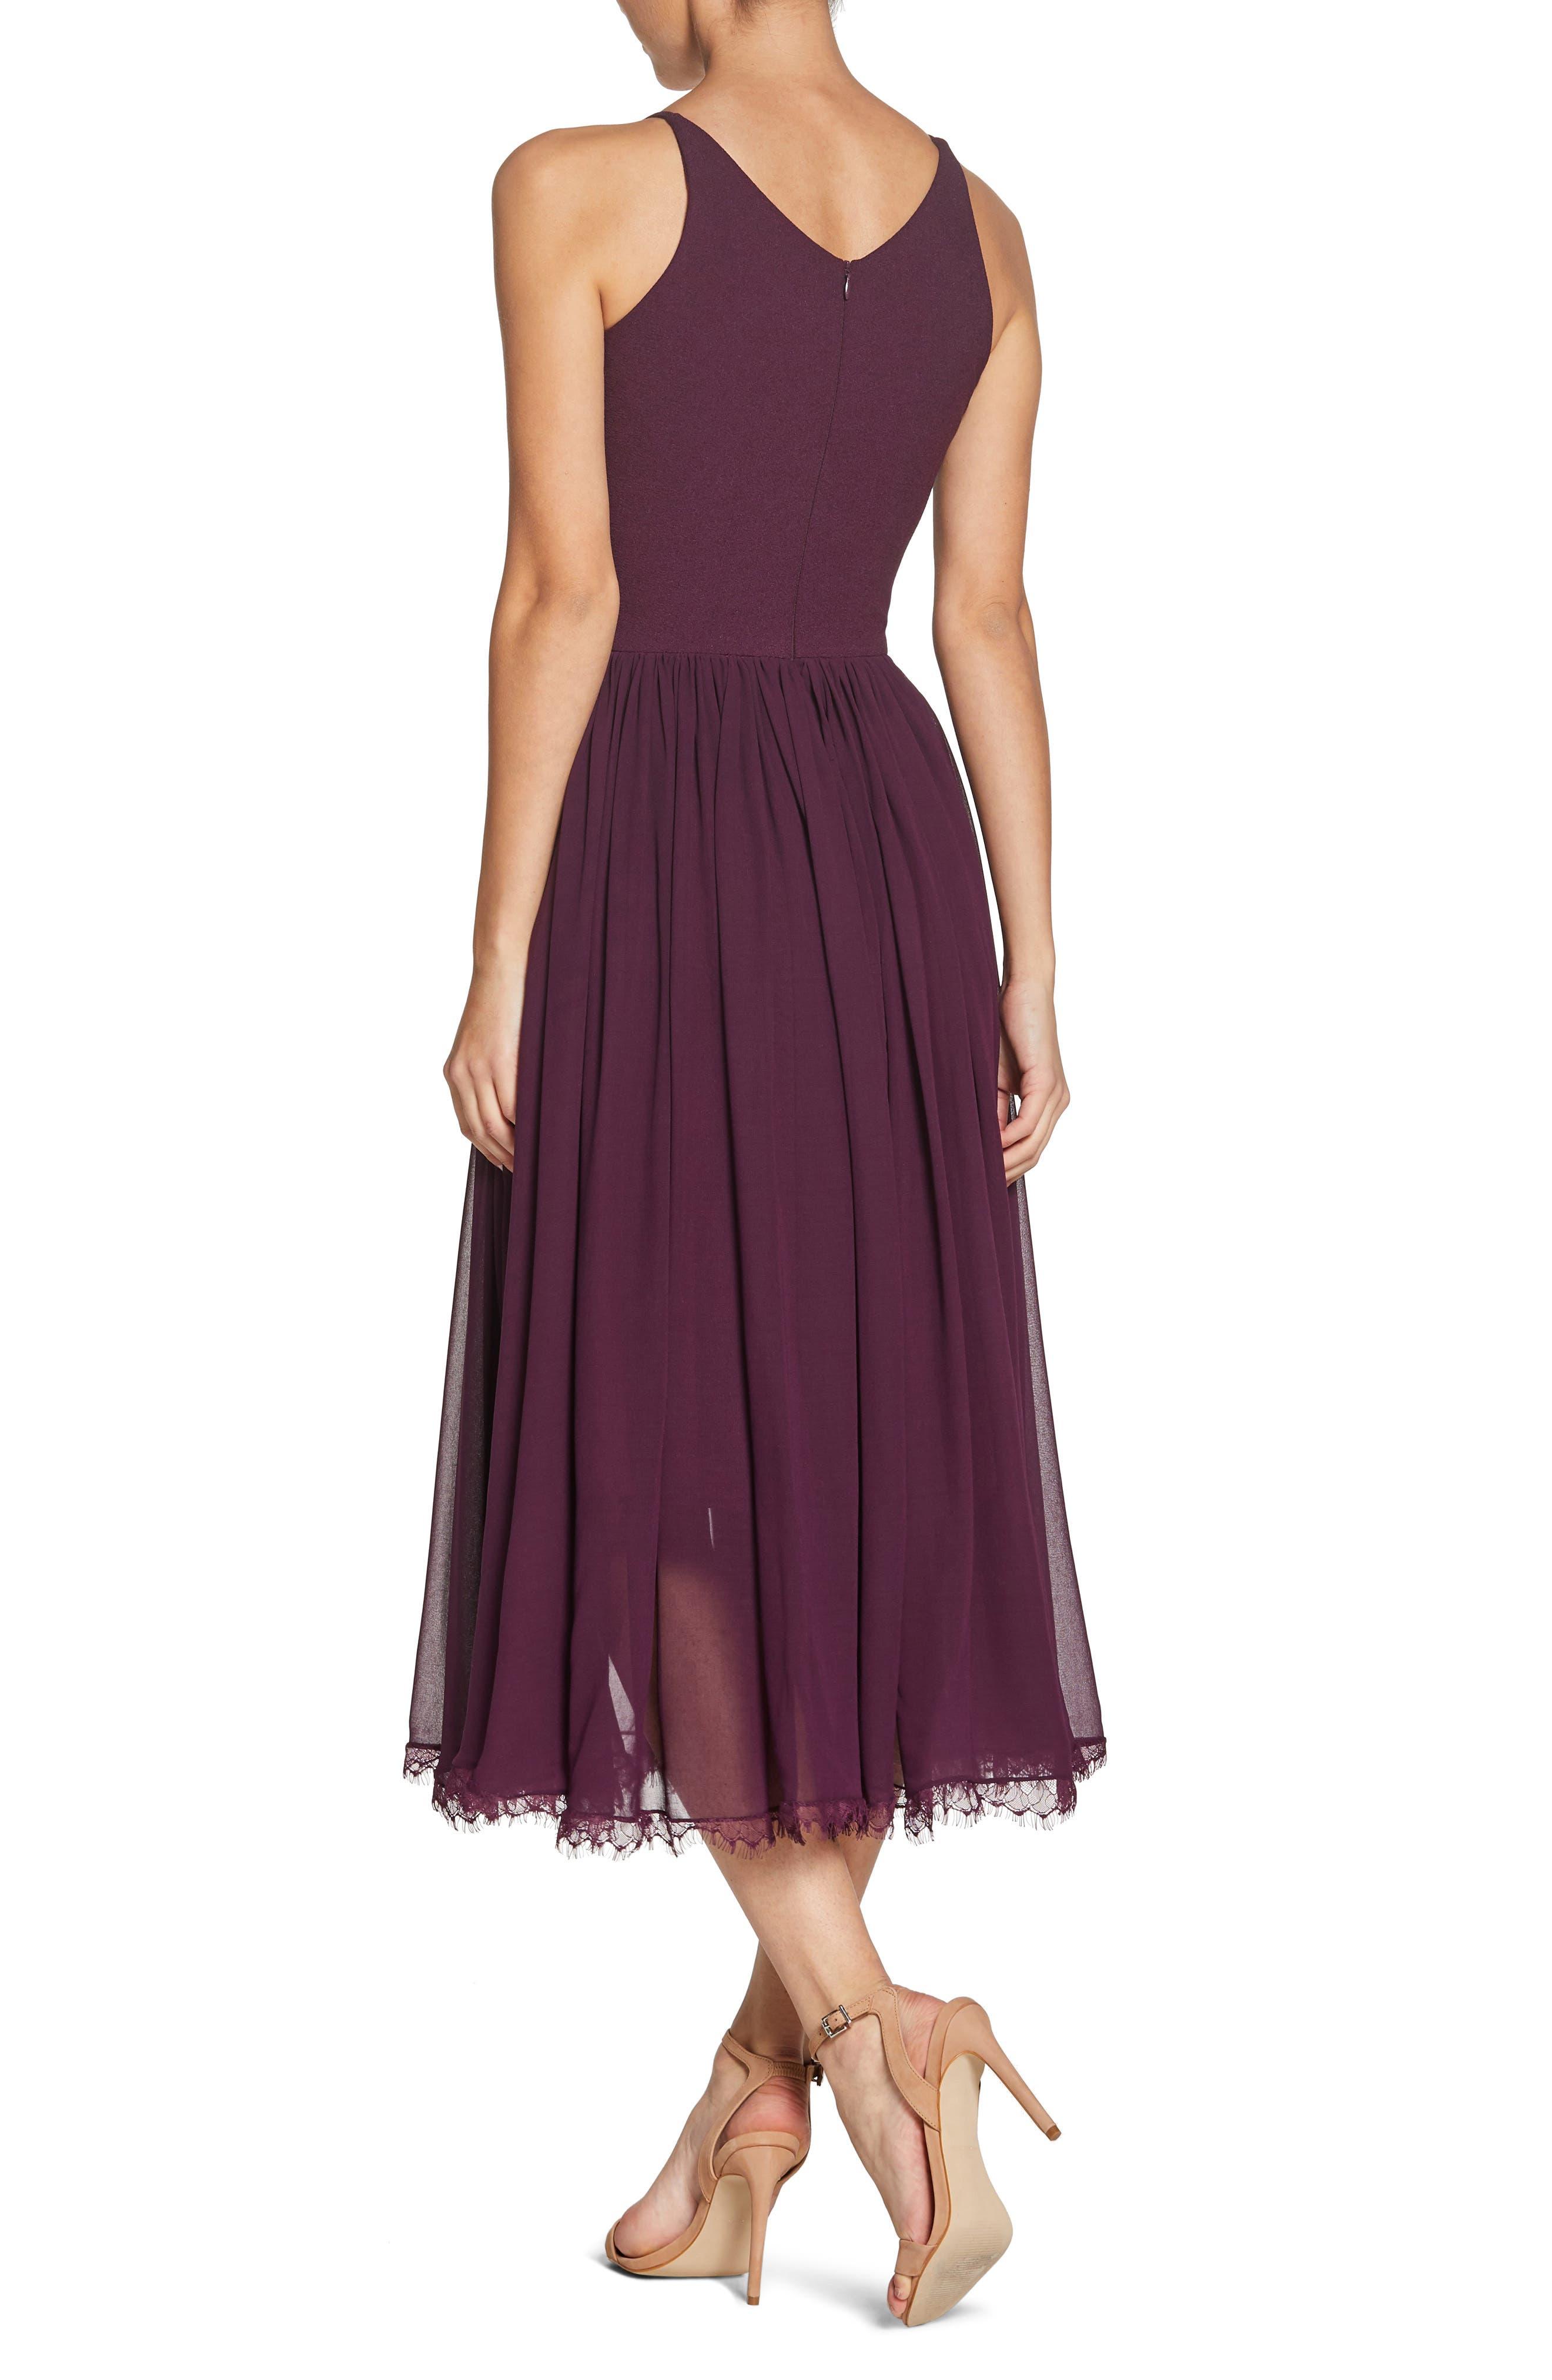 Alicia Mixed Media Midi Dress,                             Alternate thumbnail 2, color,                             PLUM